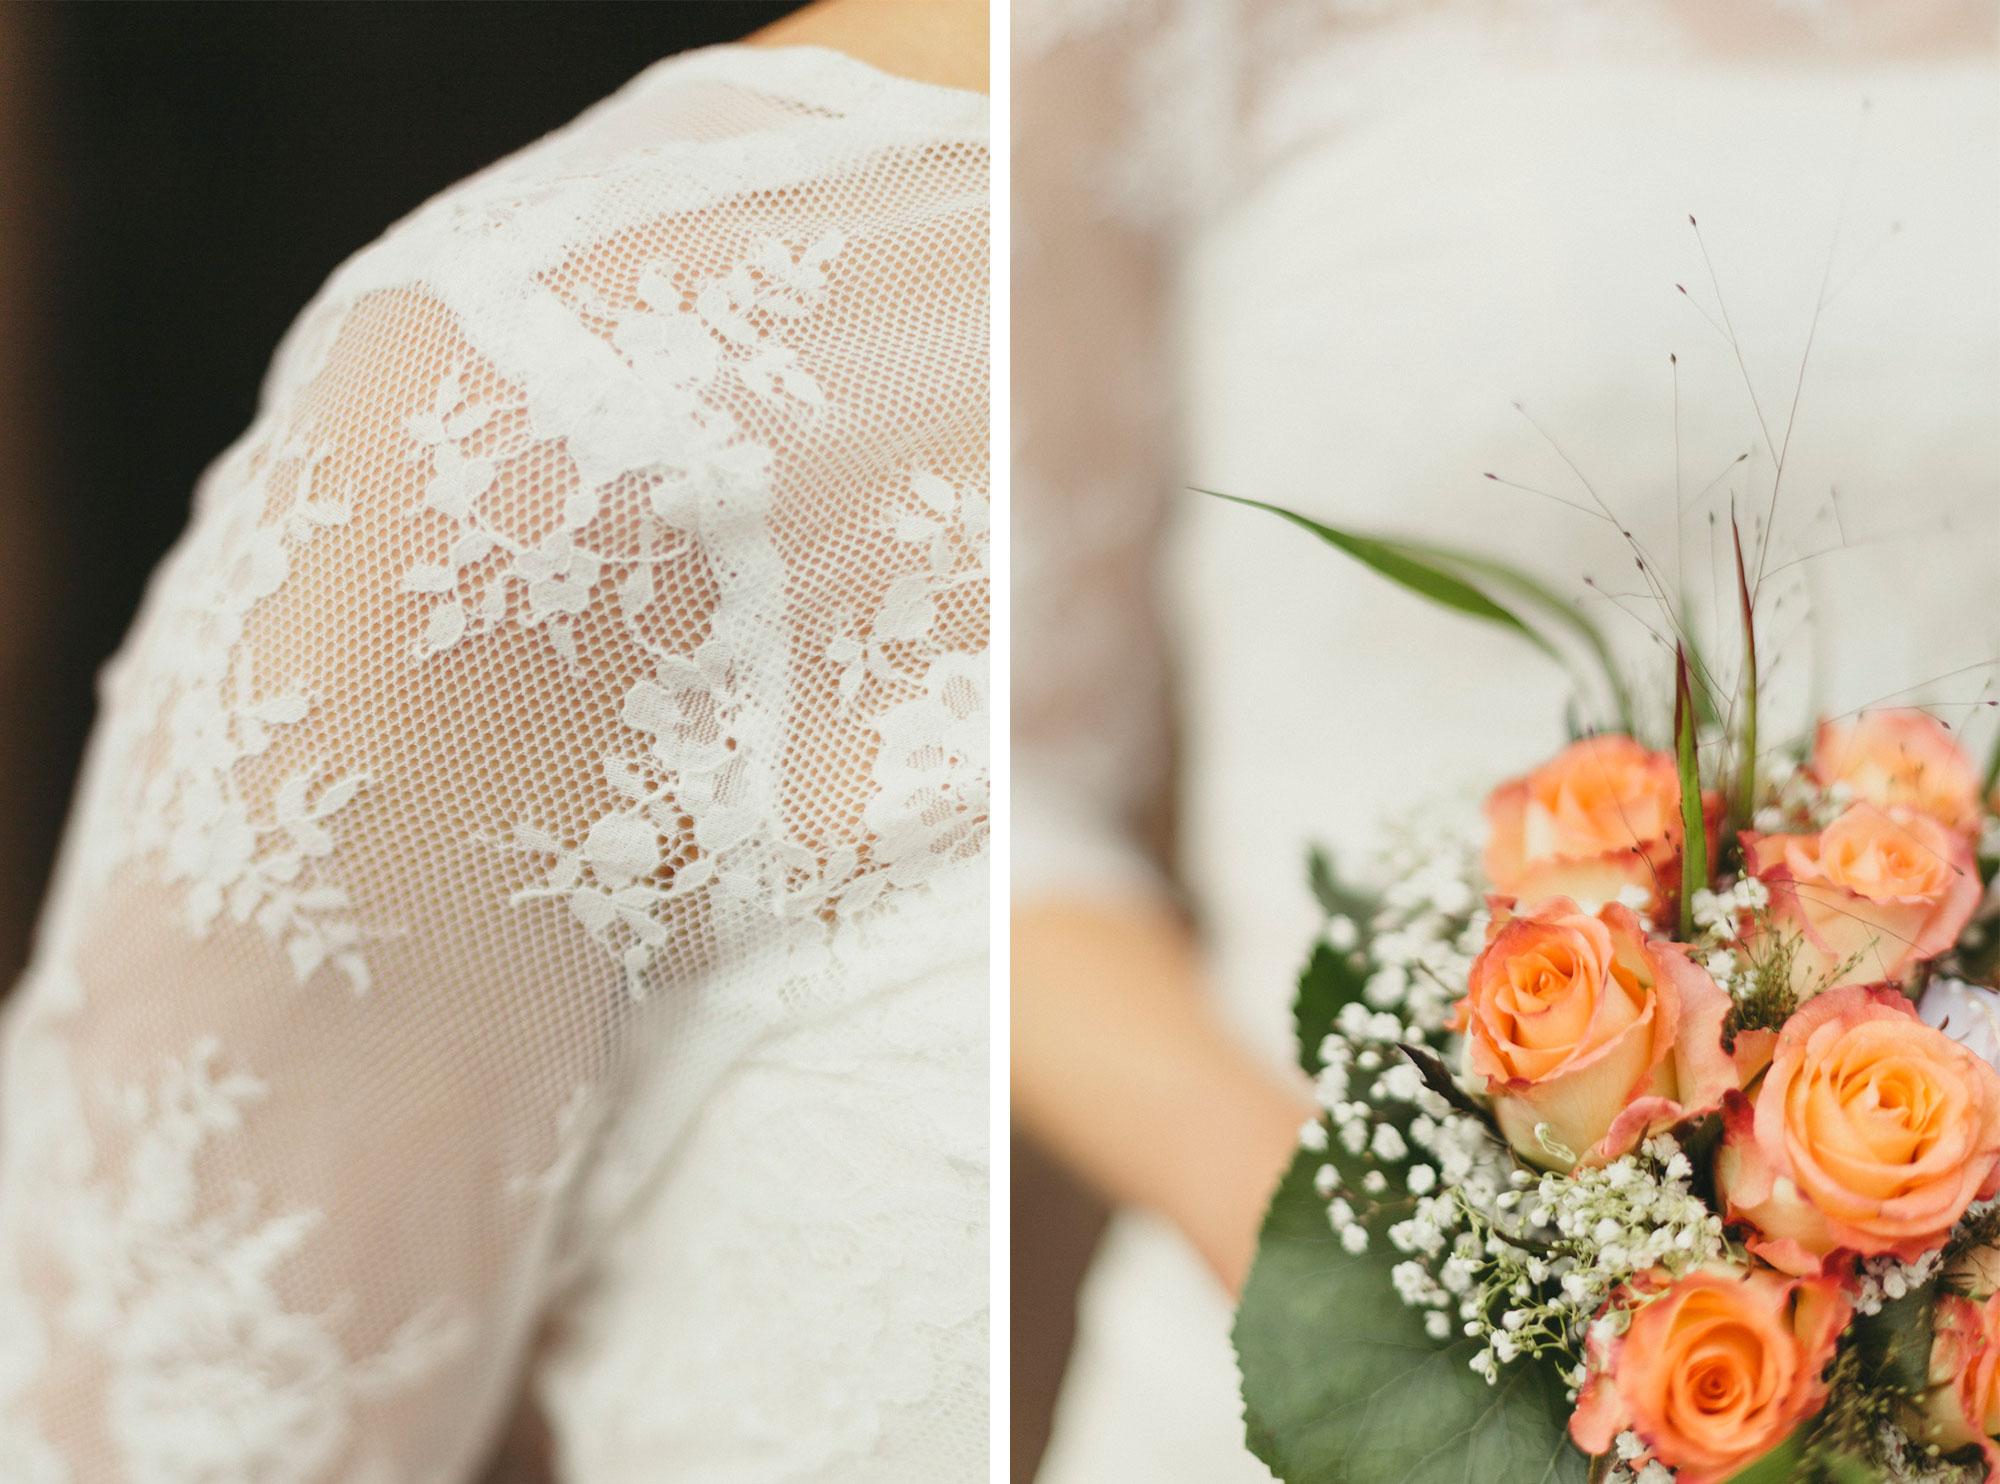 Hochzeitsfotografie-Tuebingen-Doro-Stefan-9